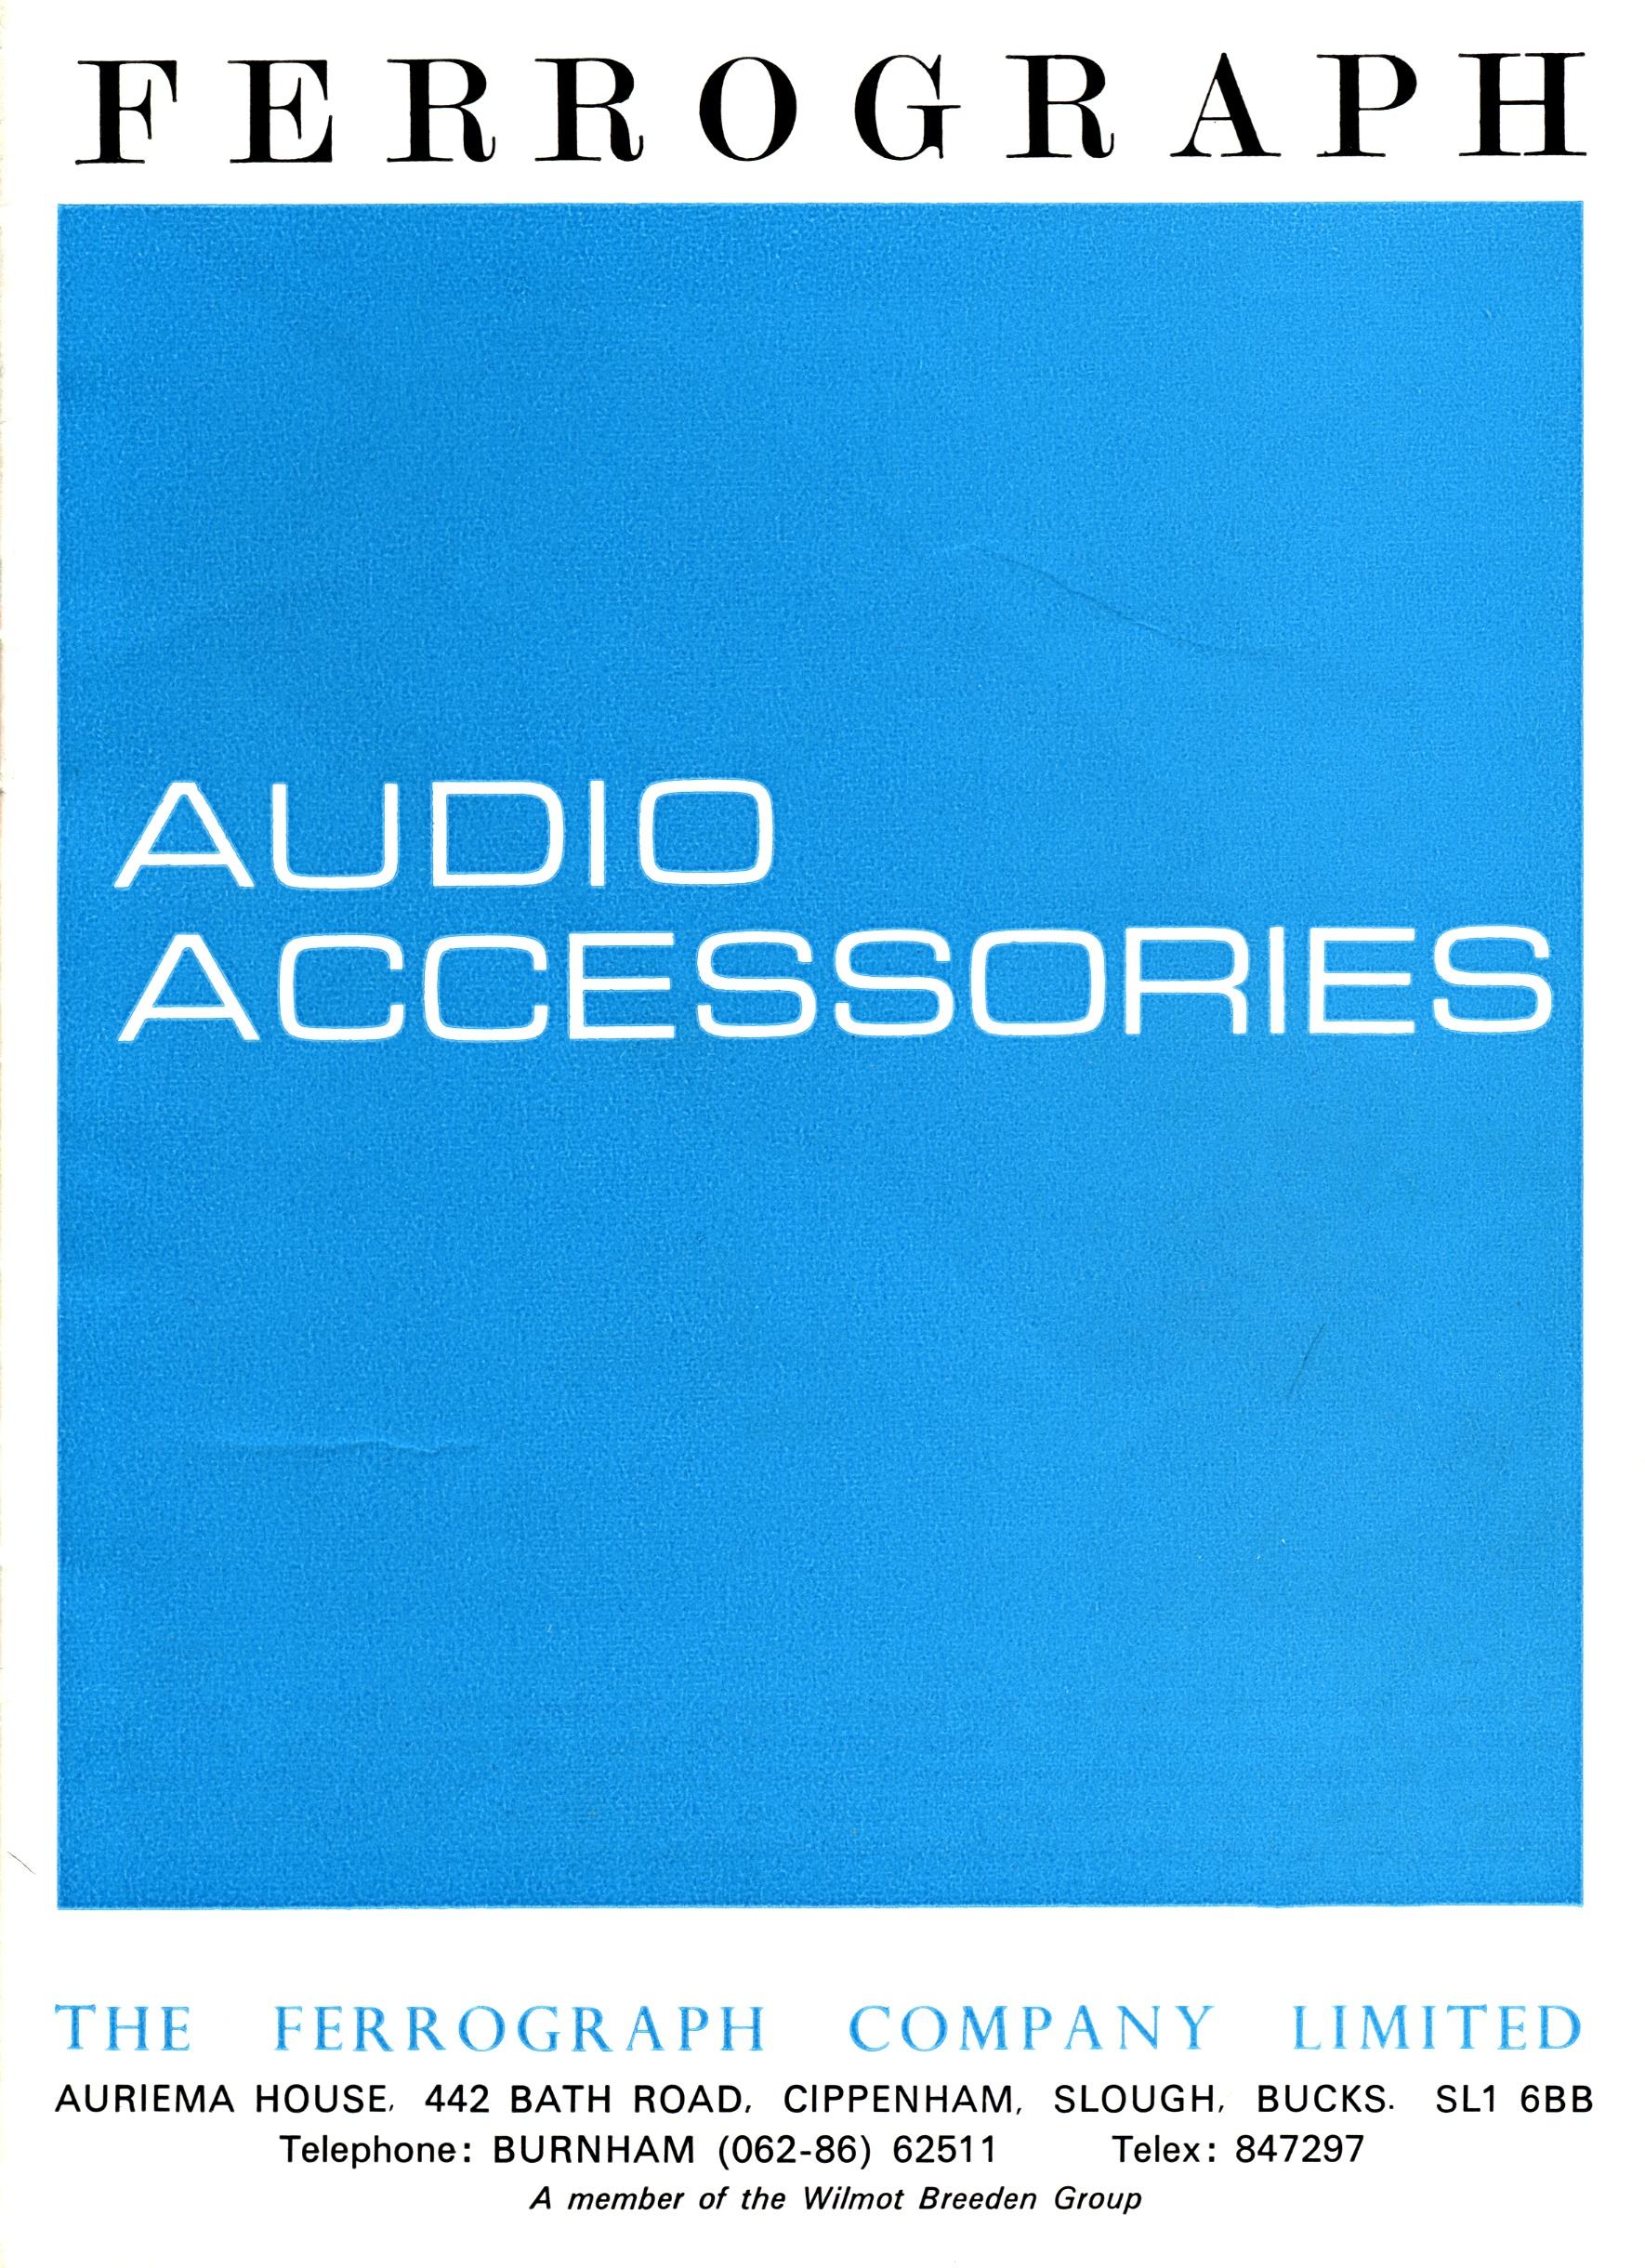 UK Hi-Fi History Society - Ferrograph Tape Recorders